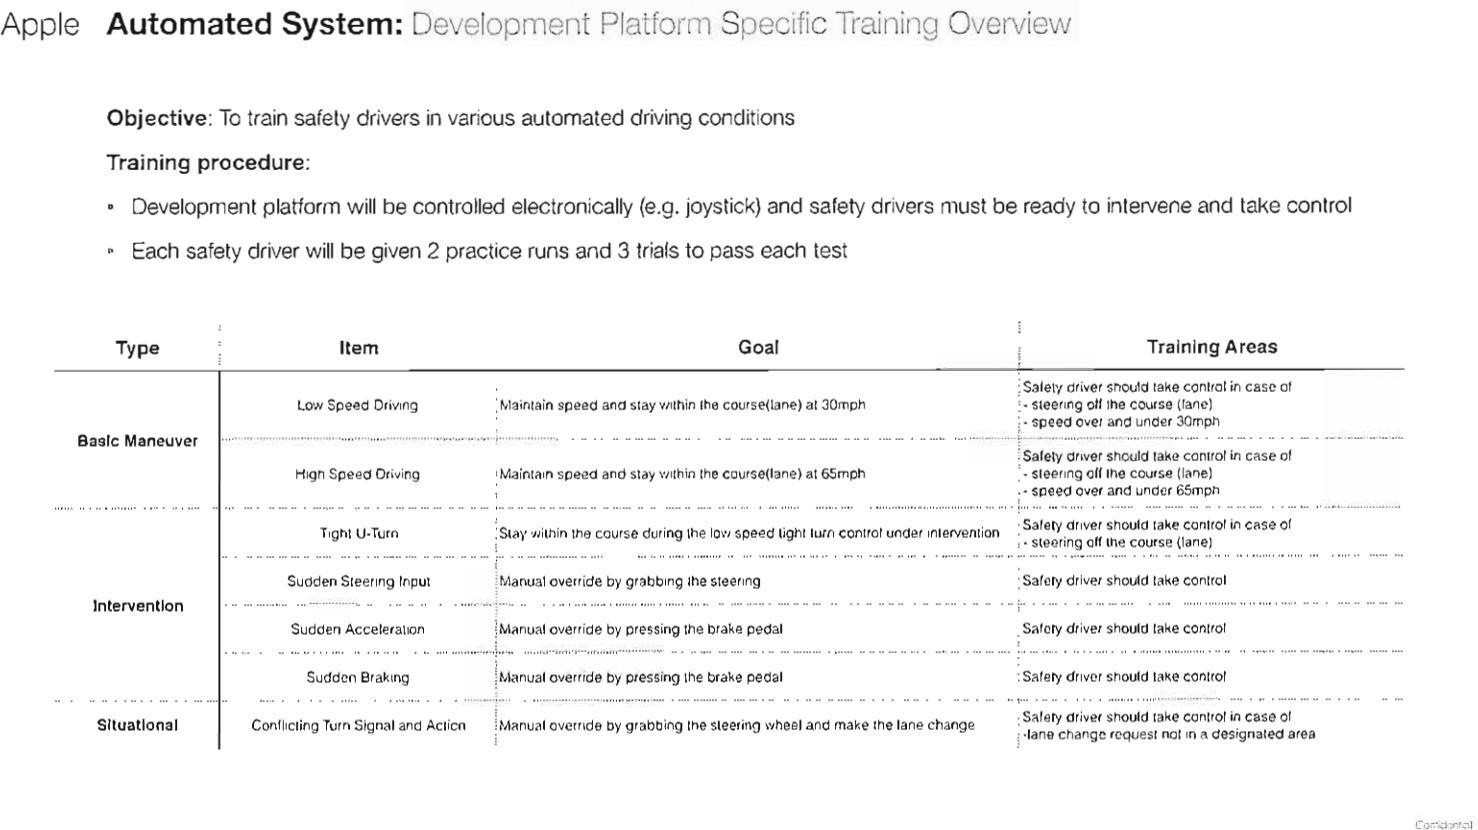 Documento sobre o Apple Automated System